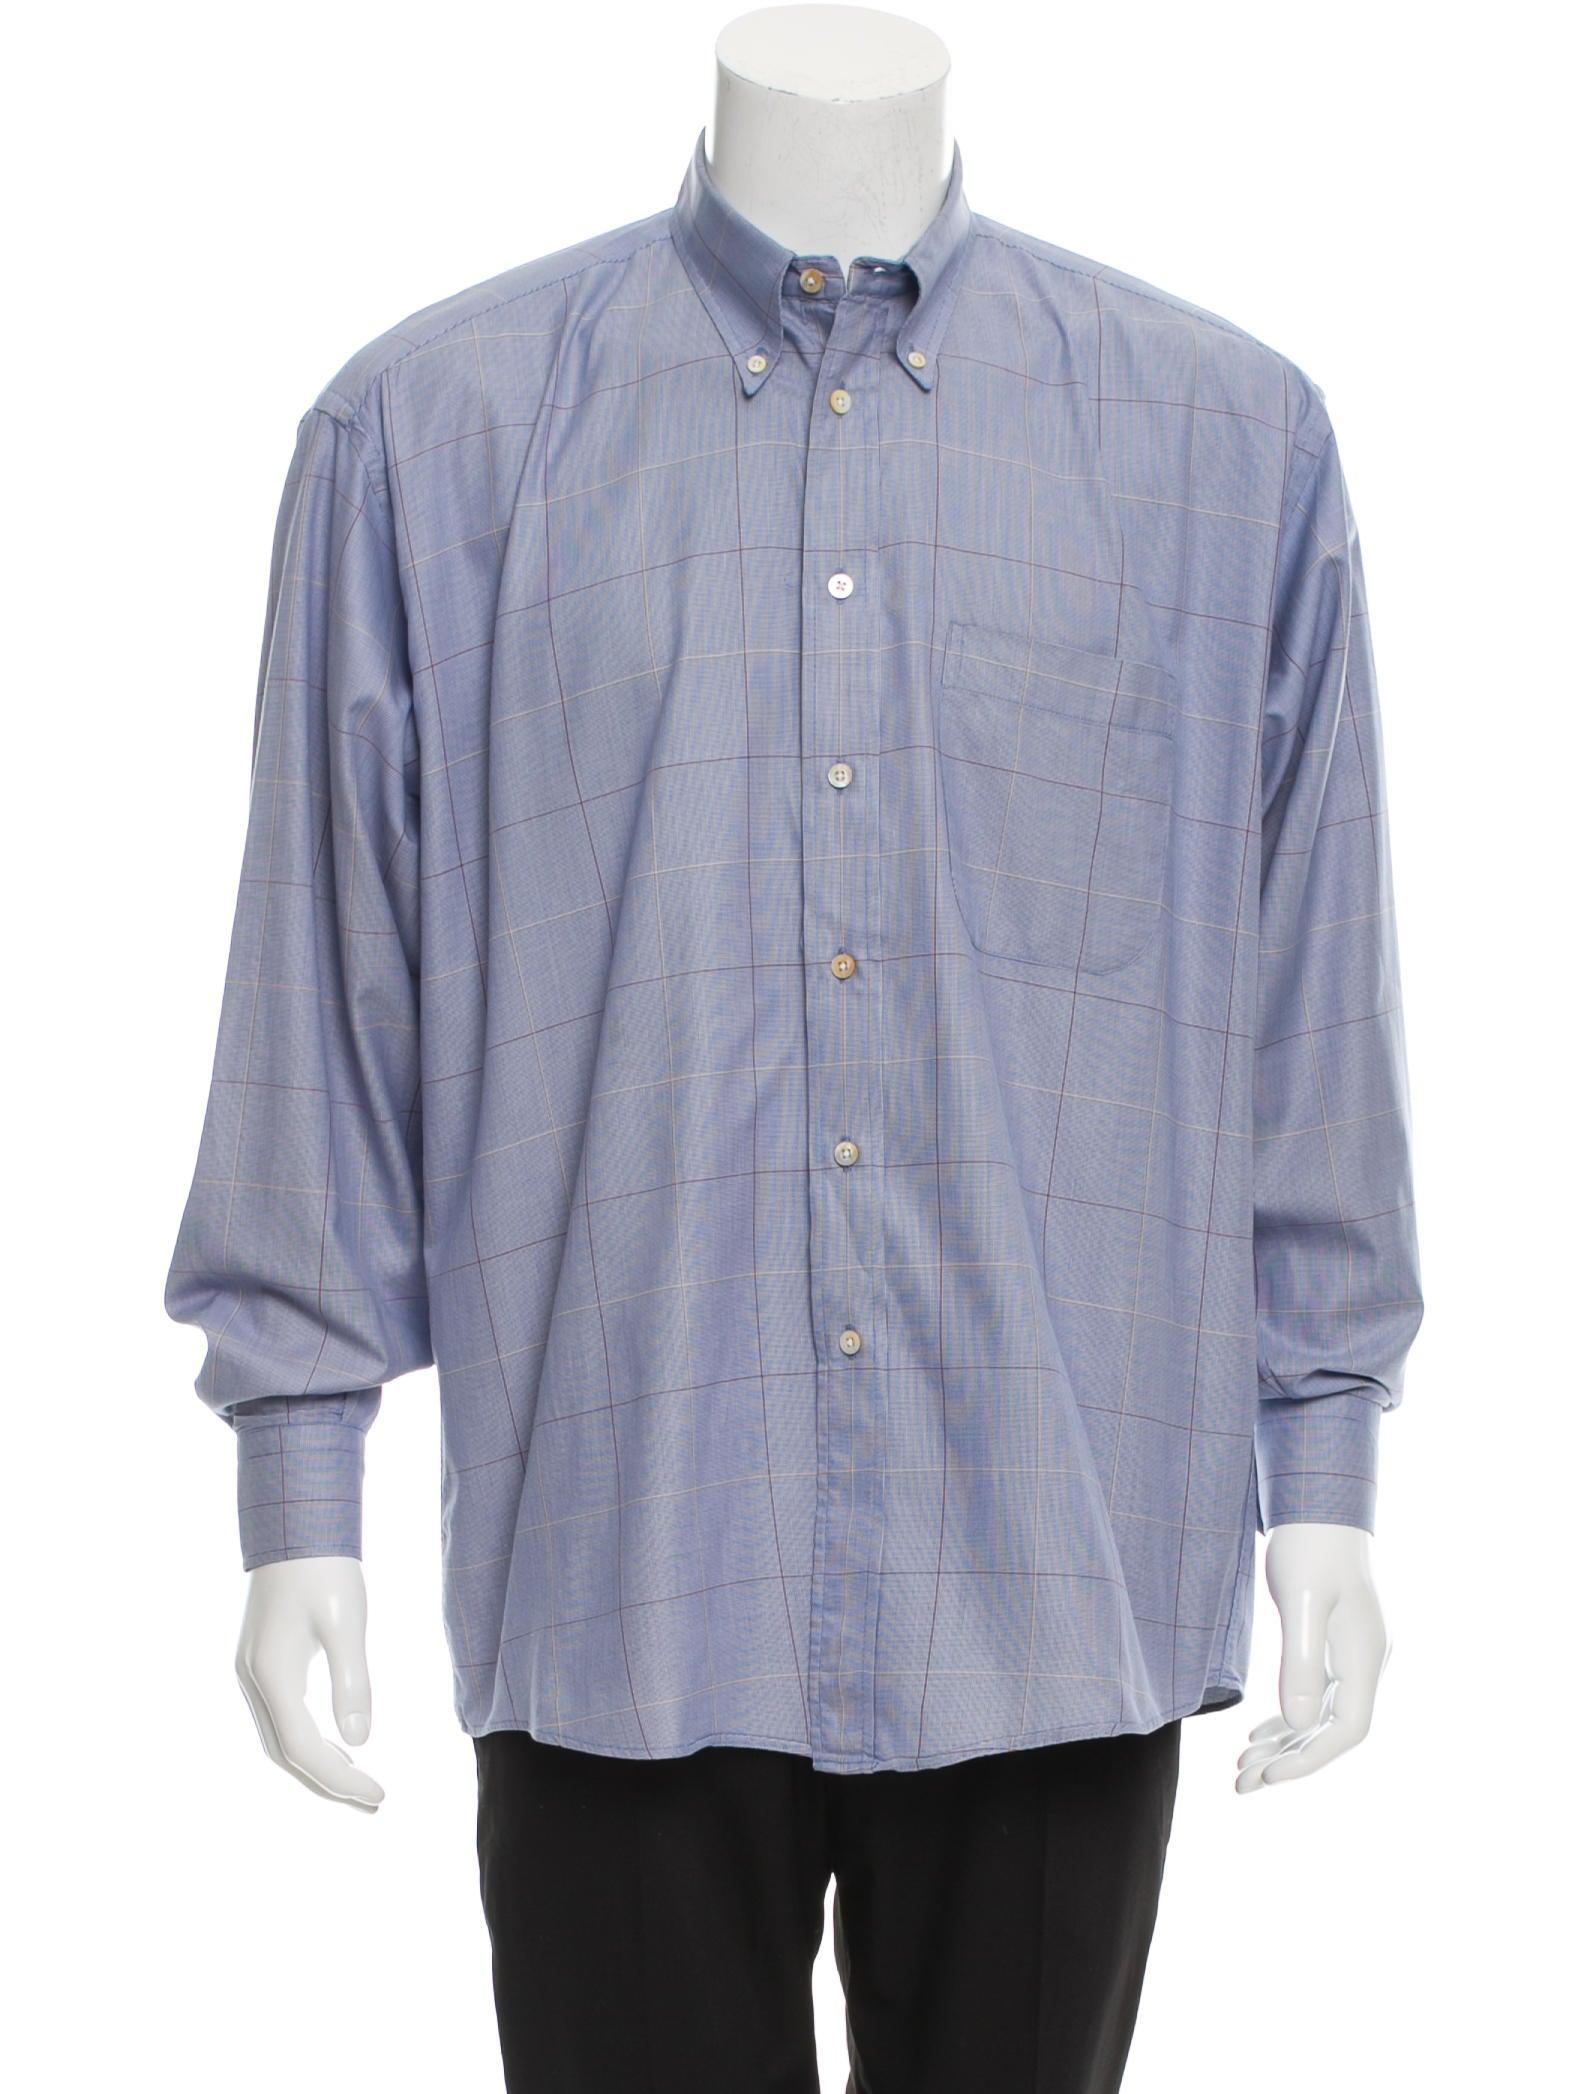 Burberry London Windowpane Button Up Shirt Clothing